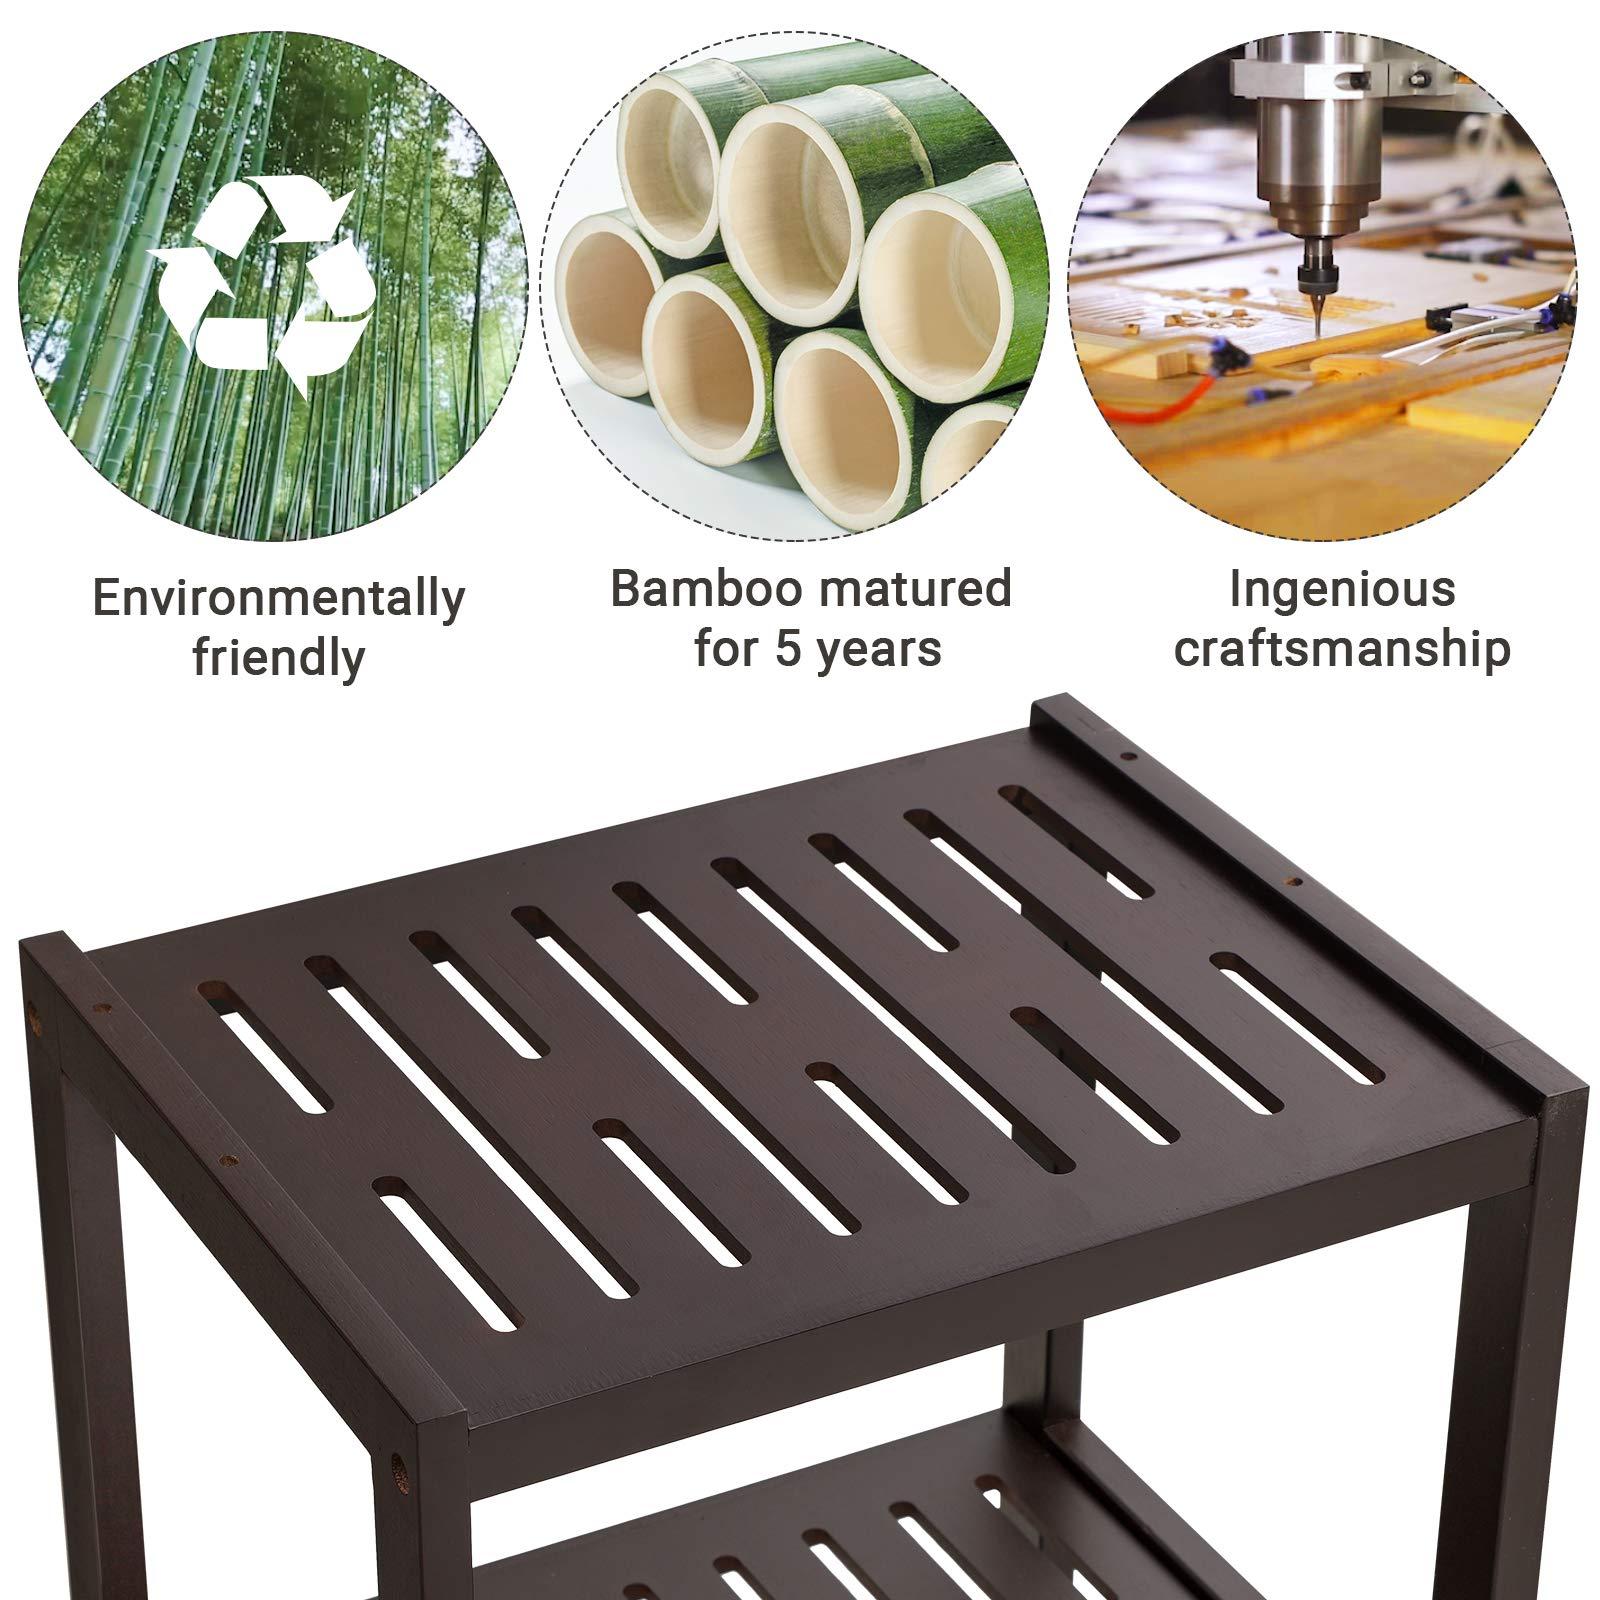 SONGMICS 7-Tier Bamboo Bathroom Shelf, 2-in-1 Design Adjustable Storage Rack, Free Standing Multifunctional Organizer, Shelving Unit for Washroom, Living Room, Kitchen, Brown UBCR01BR by SONGMICS (Image #8)